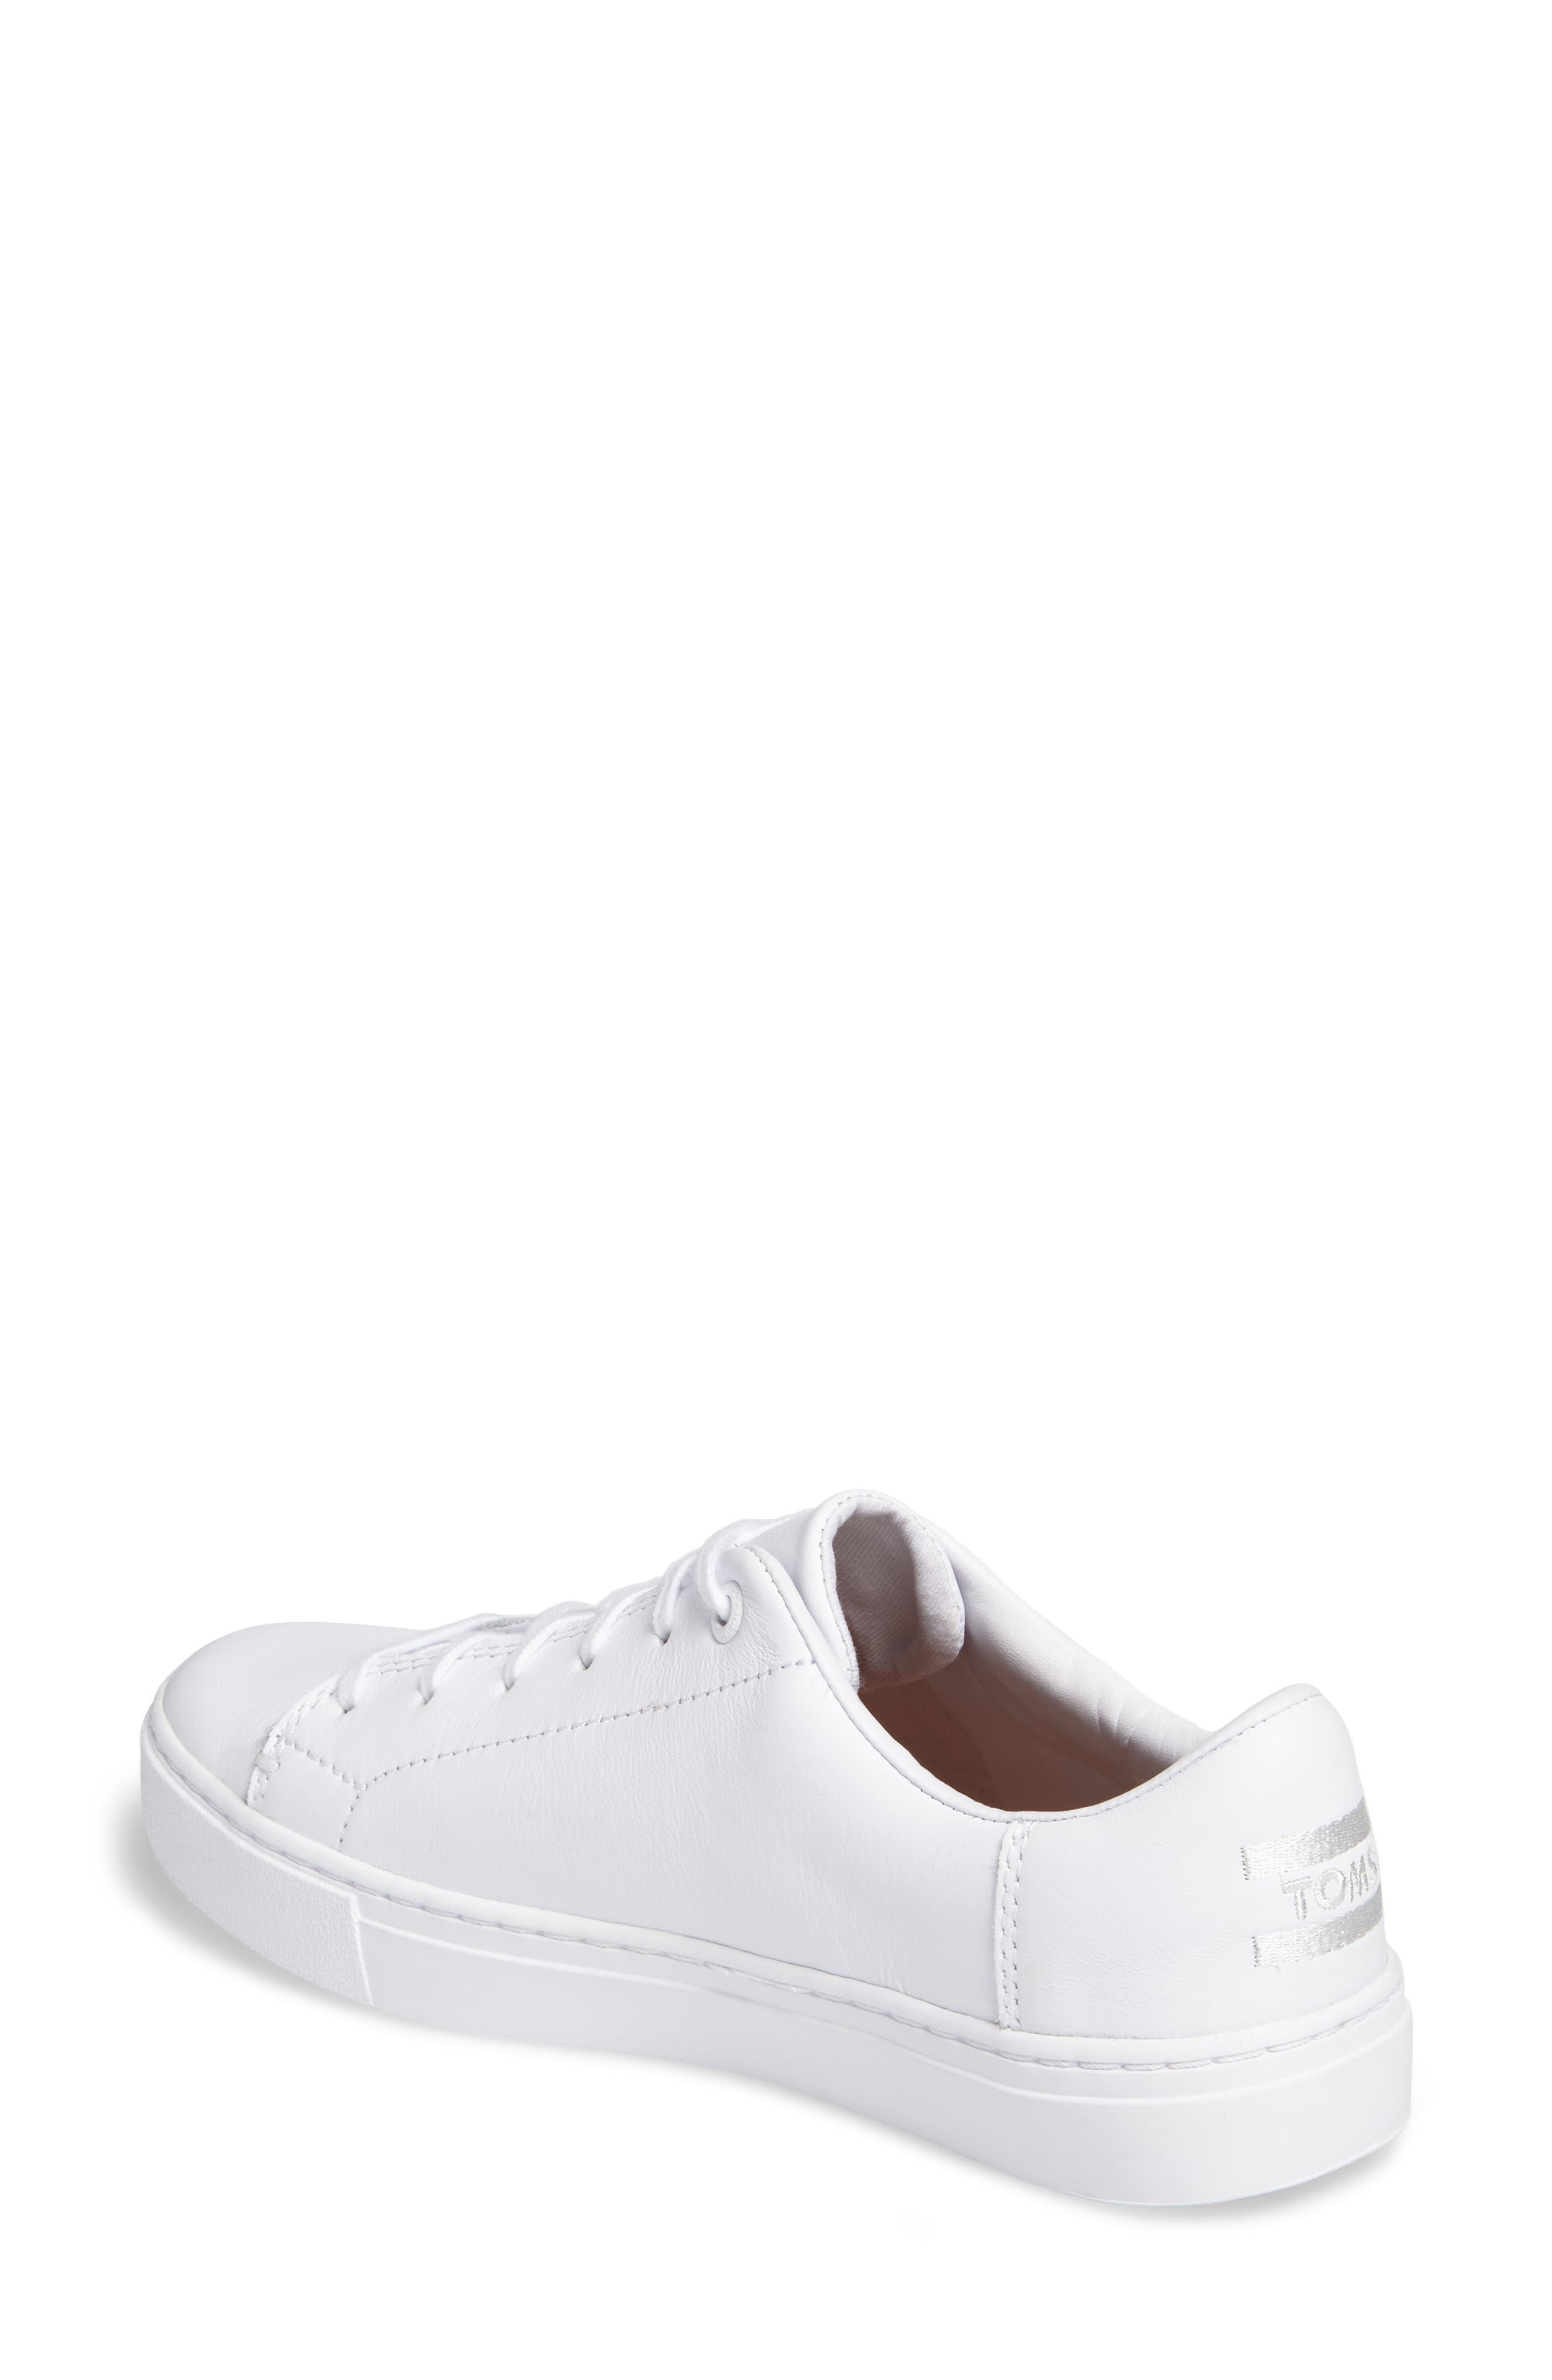 Lenox Sneaker,                             Alternate thumbnail 23, color,